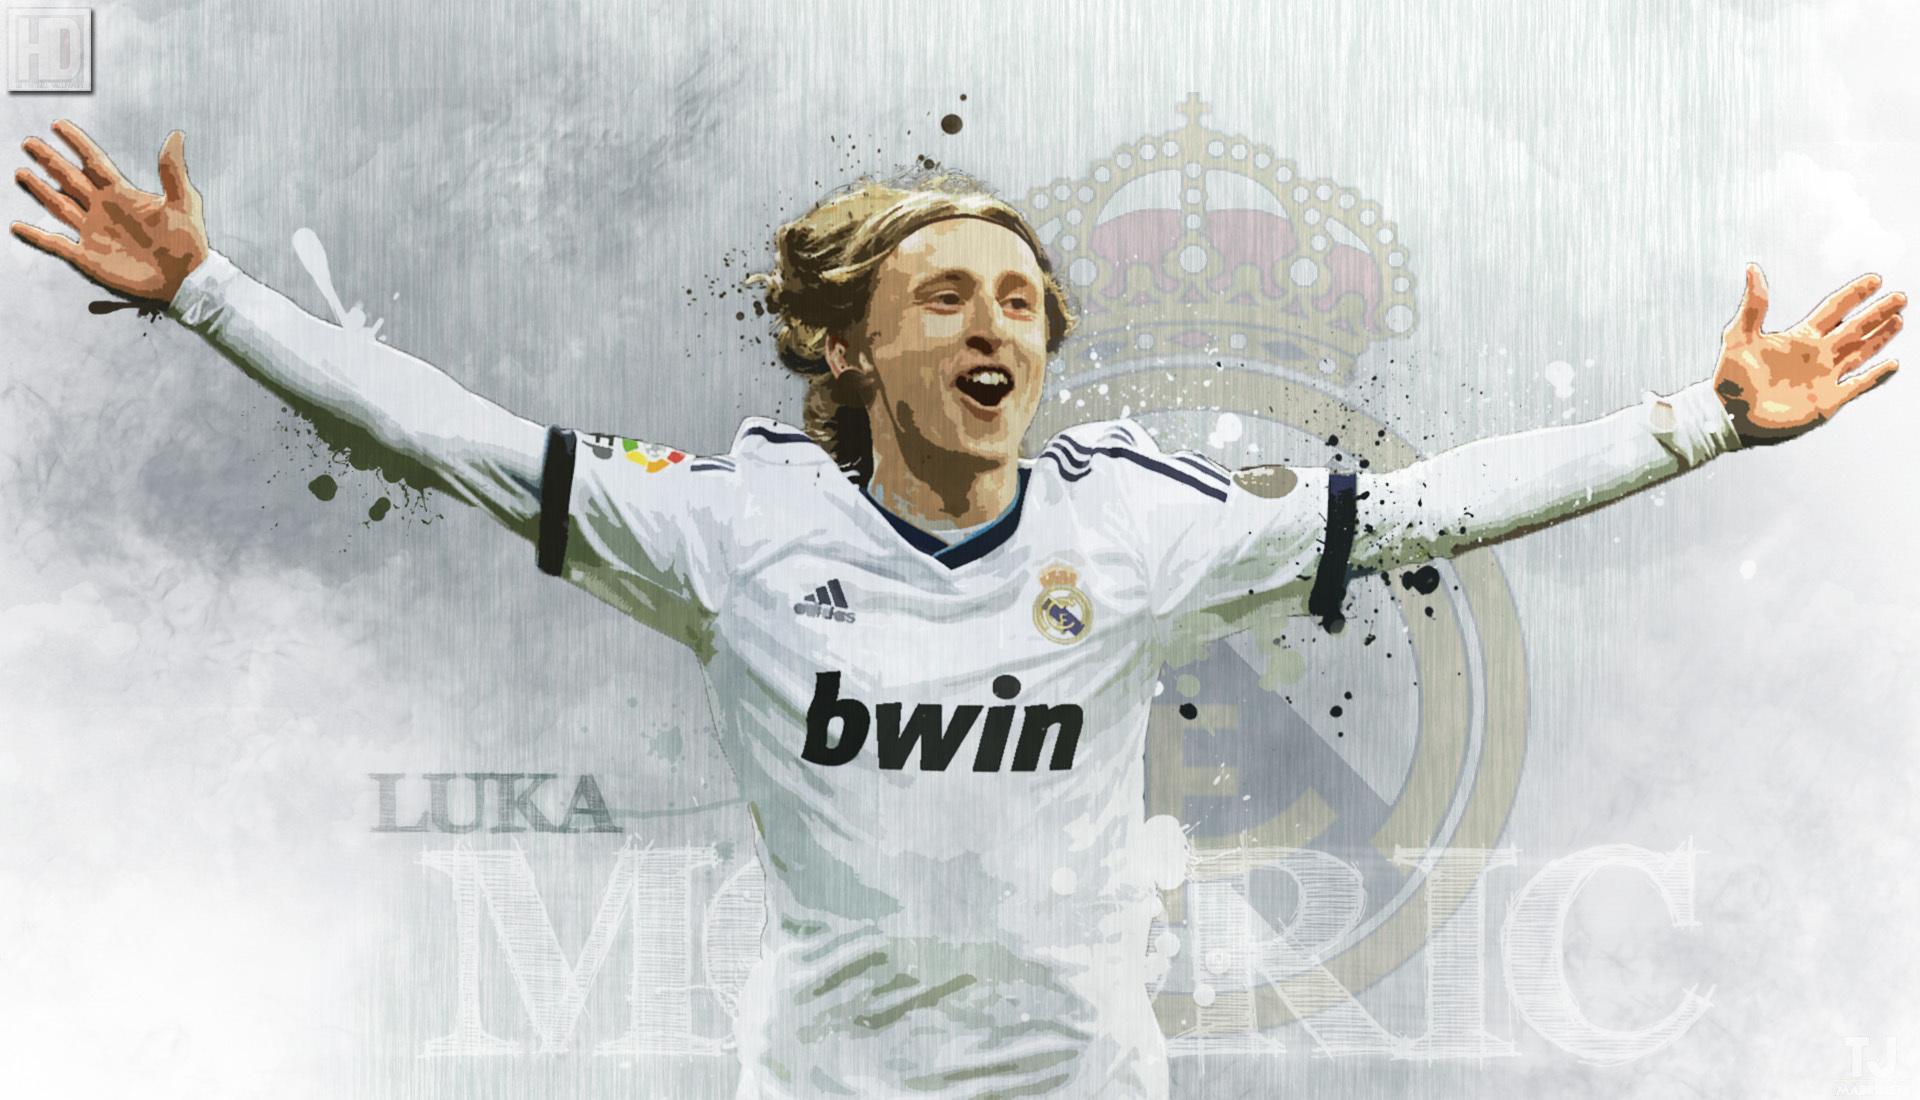 Luka Modric HD Background